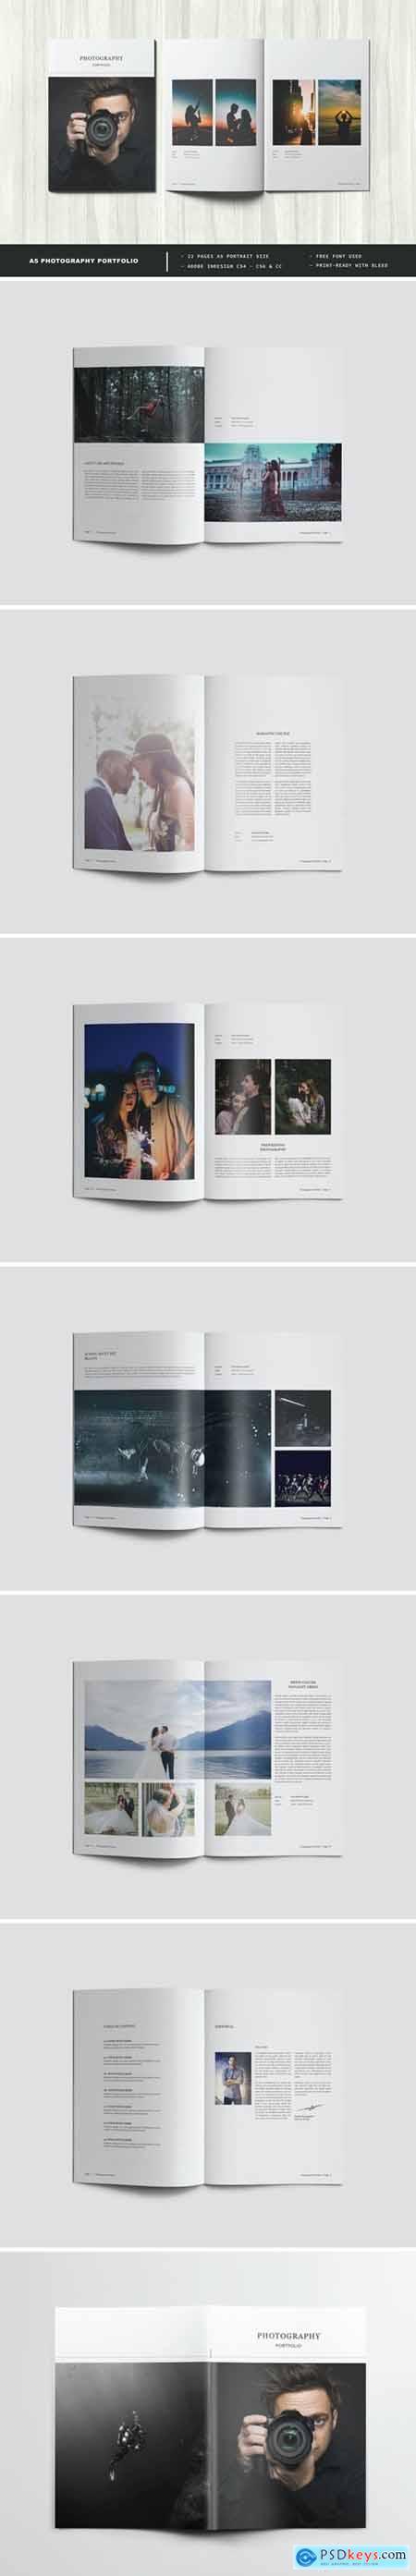 A5 Photography Portfolio - Photo Album